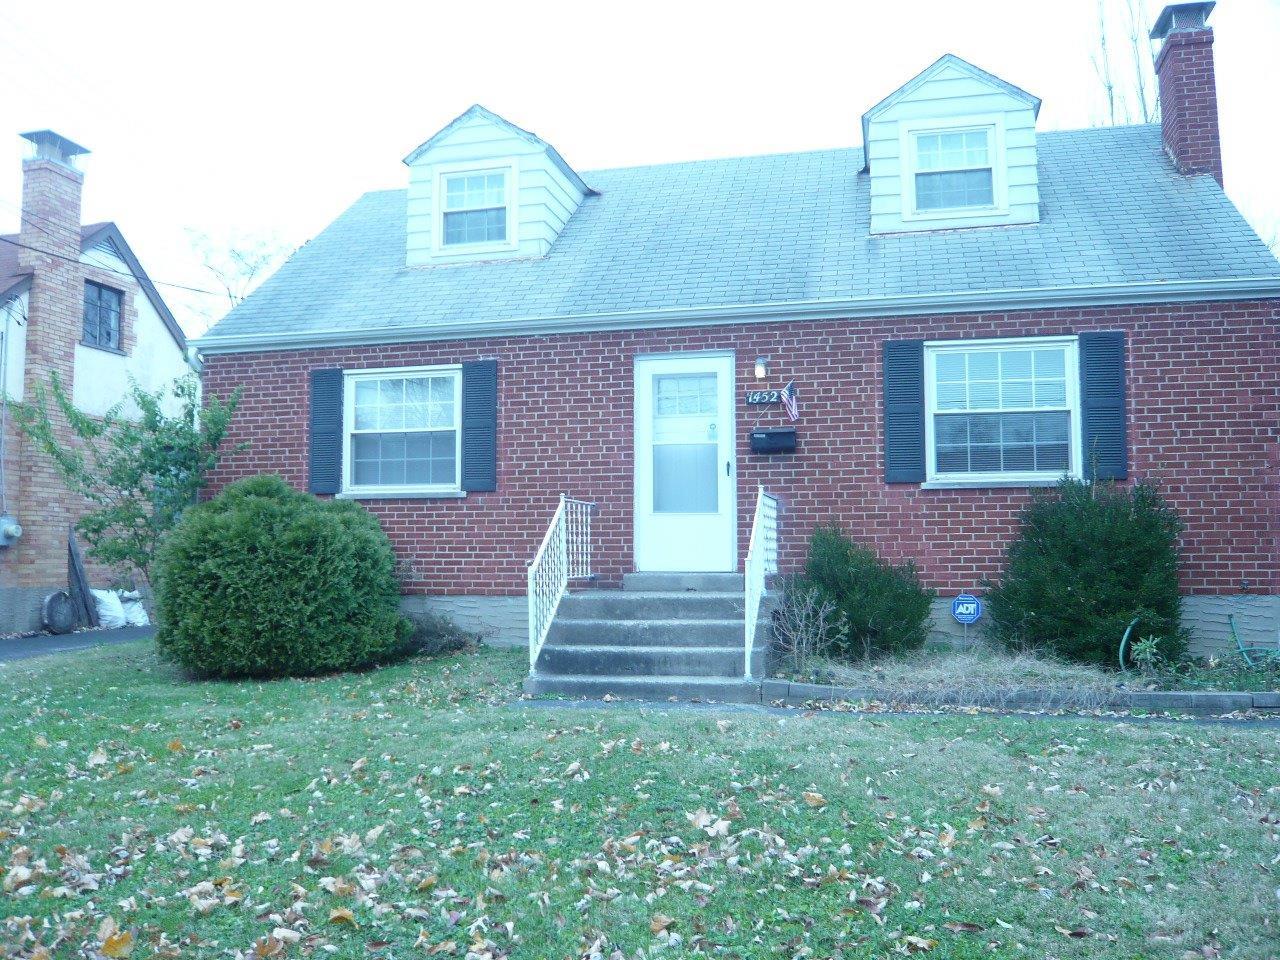 Property for sale at 1452 Van Fleet Avenue, Mt Healthy,  OH 45231